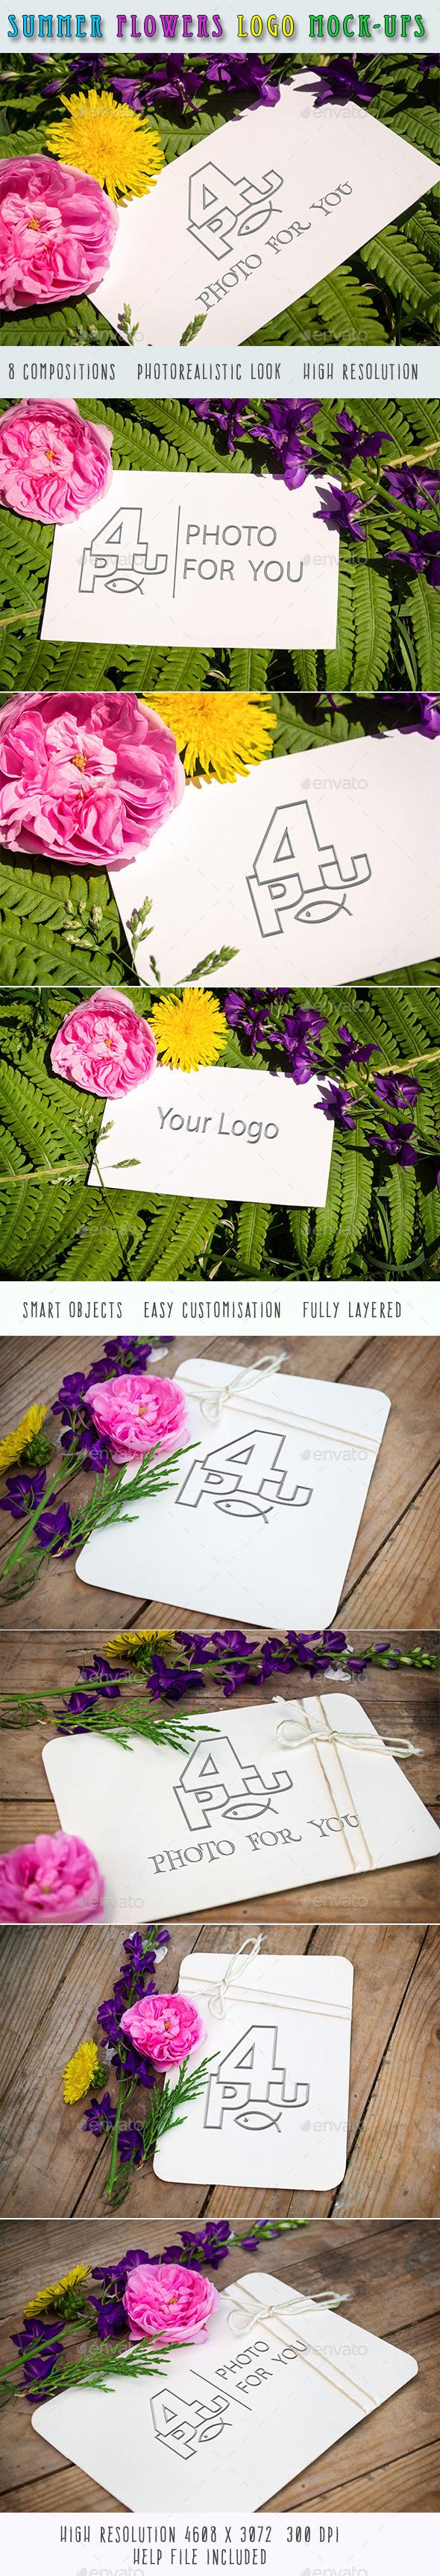 Summer Flowers Logo Mock-Ups - Product Mock-Ups Graphics